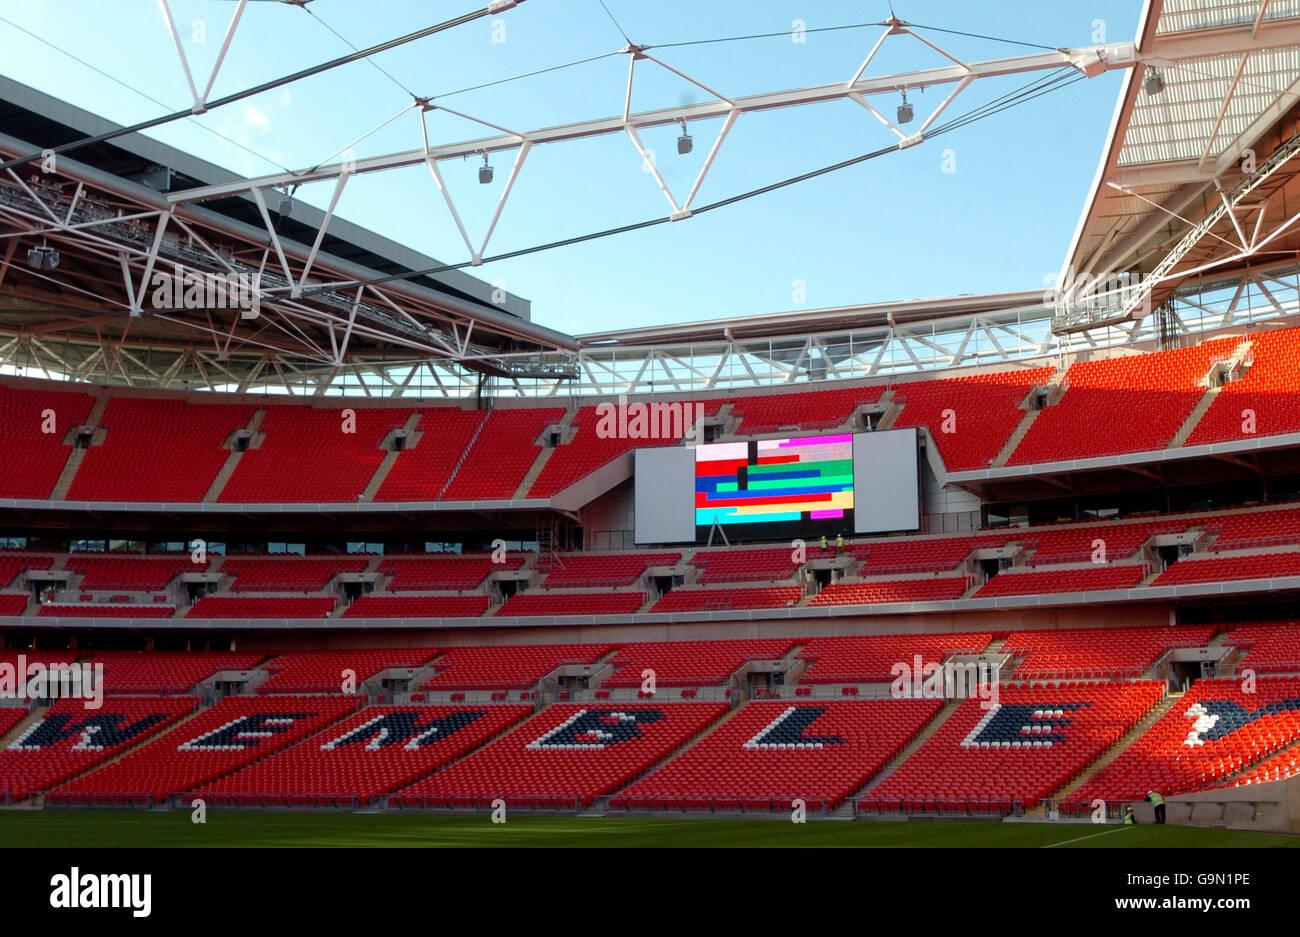 Wembley Stadium Concert Stock Photos & Wembley Stadium